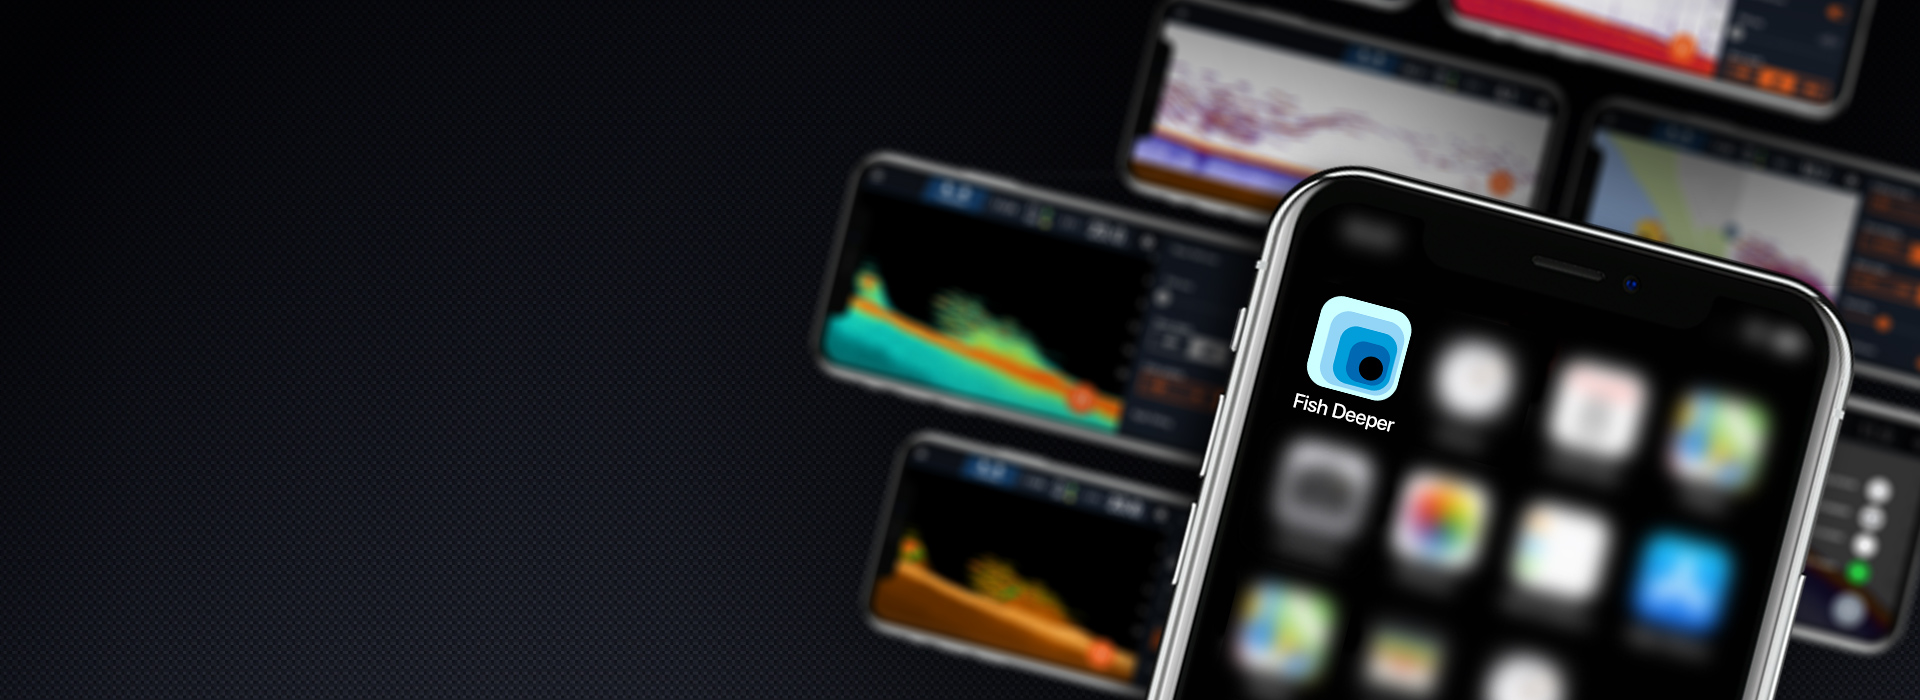 Fish Deeper™로 낚시 경험 향상하나의 앱. 다양한 낚시 가능성.